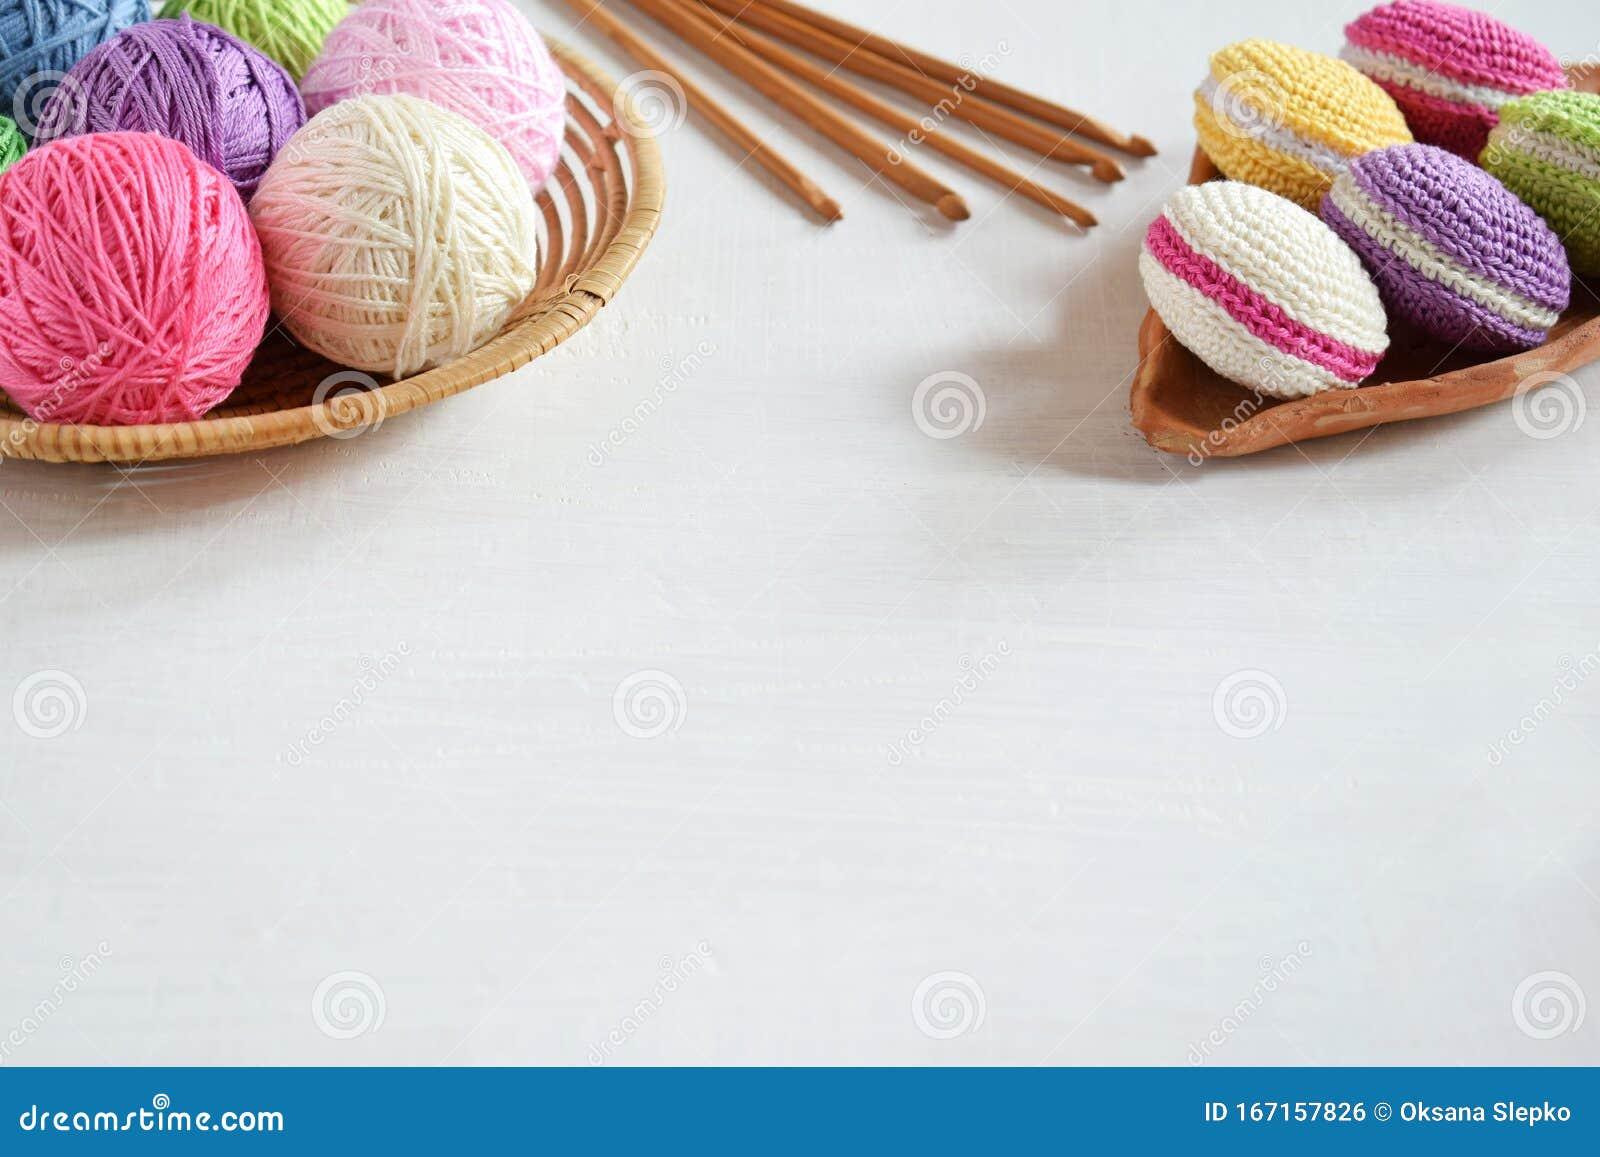 5-ply baby soft milk cotton yarn 100g (Multi tone) for crochet ... | 1155x1600